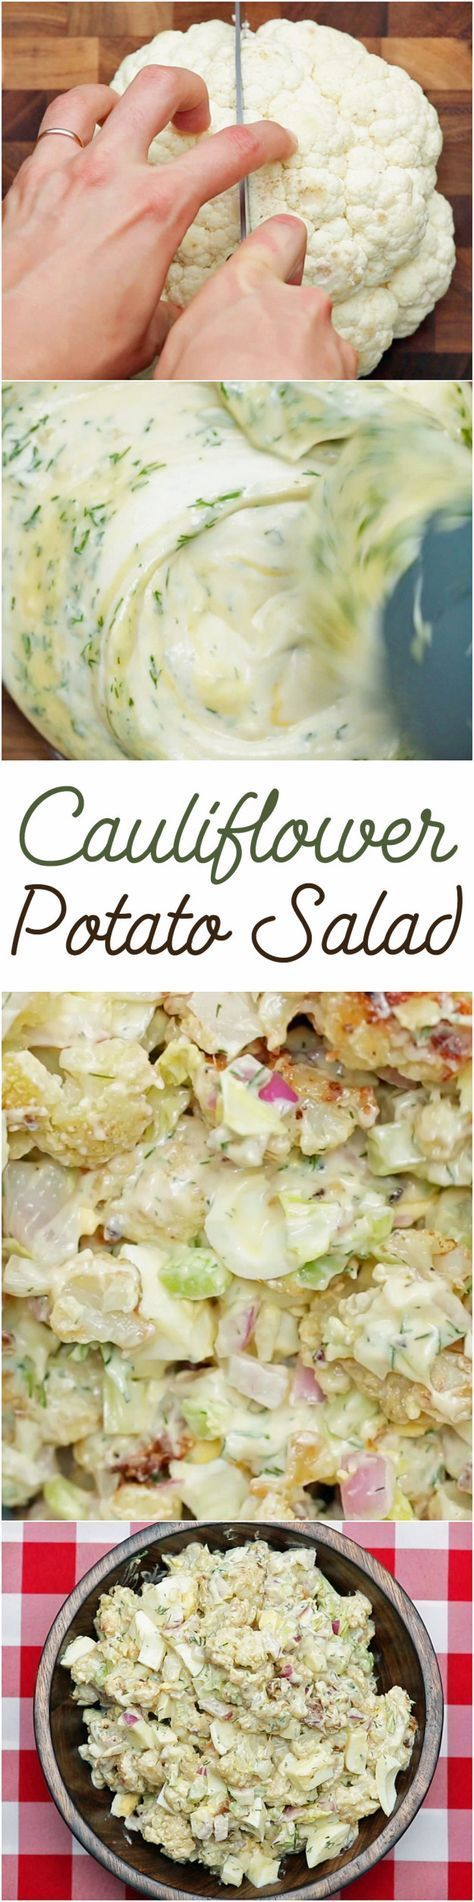 Cauliflower Potato Salad Make vegan: Coconut milk yogurt Replace eggs with avocado and/or garbanzos with namakala salt